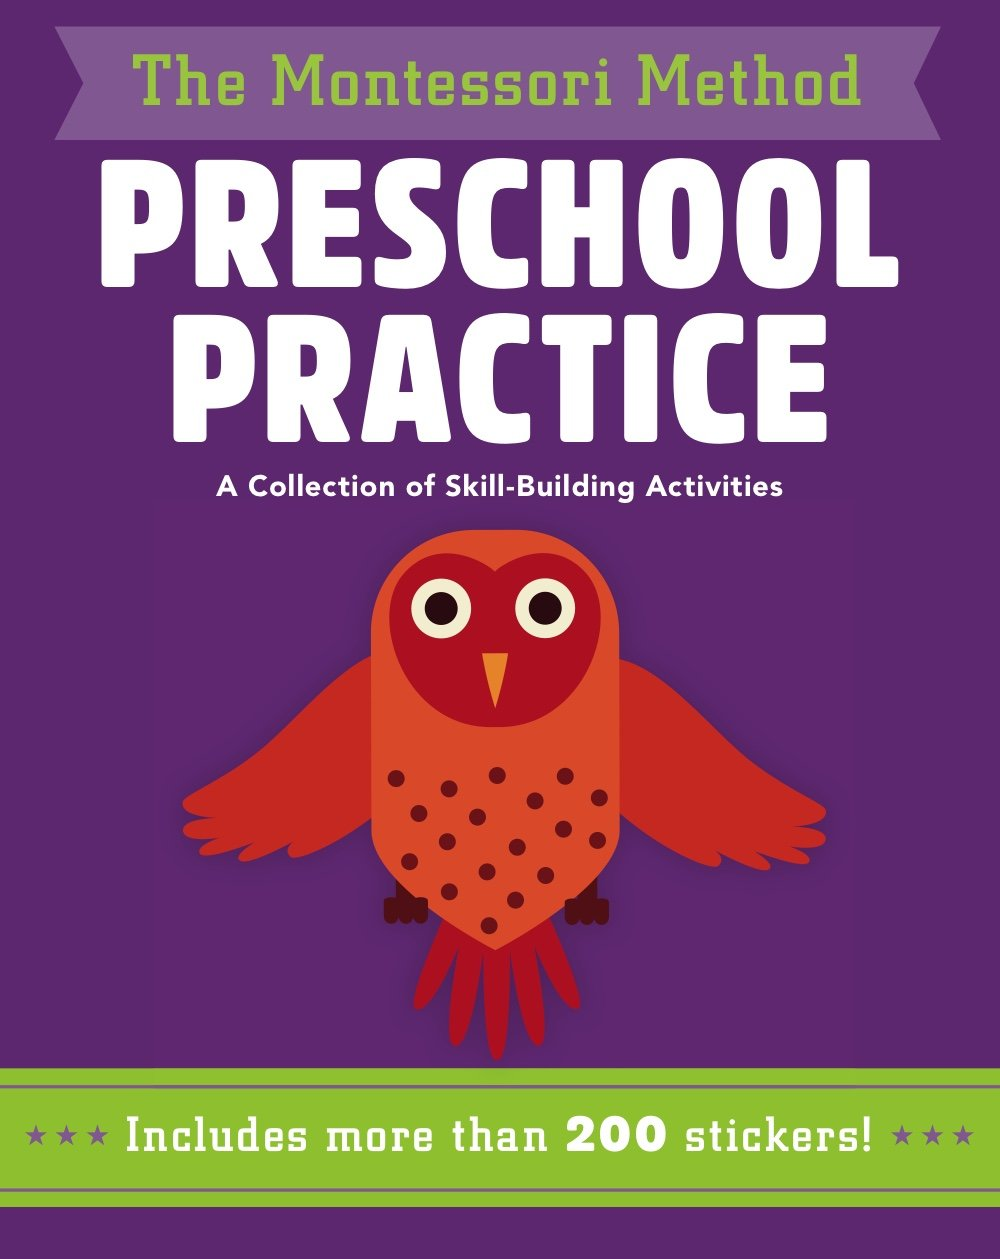 preschool-practice-a-collection-of-skill-building-activities-the-montessori-method